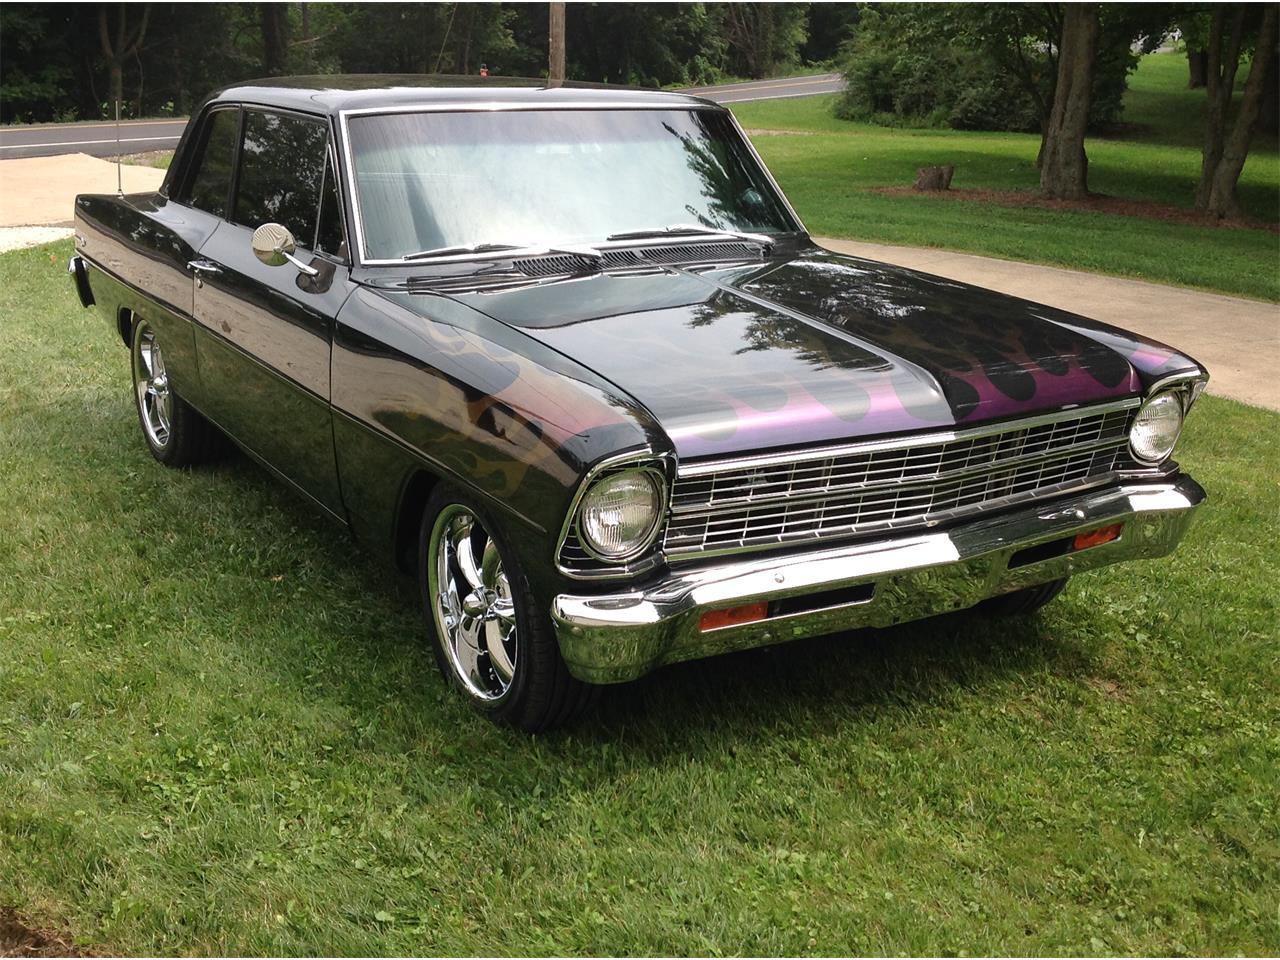 1967 Chevrolet Nova II (CC-1223387) for sale in Mill Hall, Pennsylvania